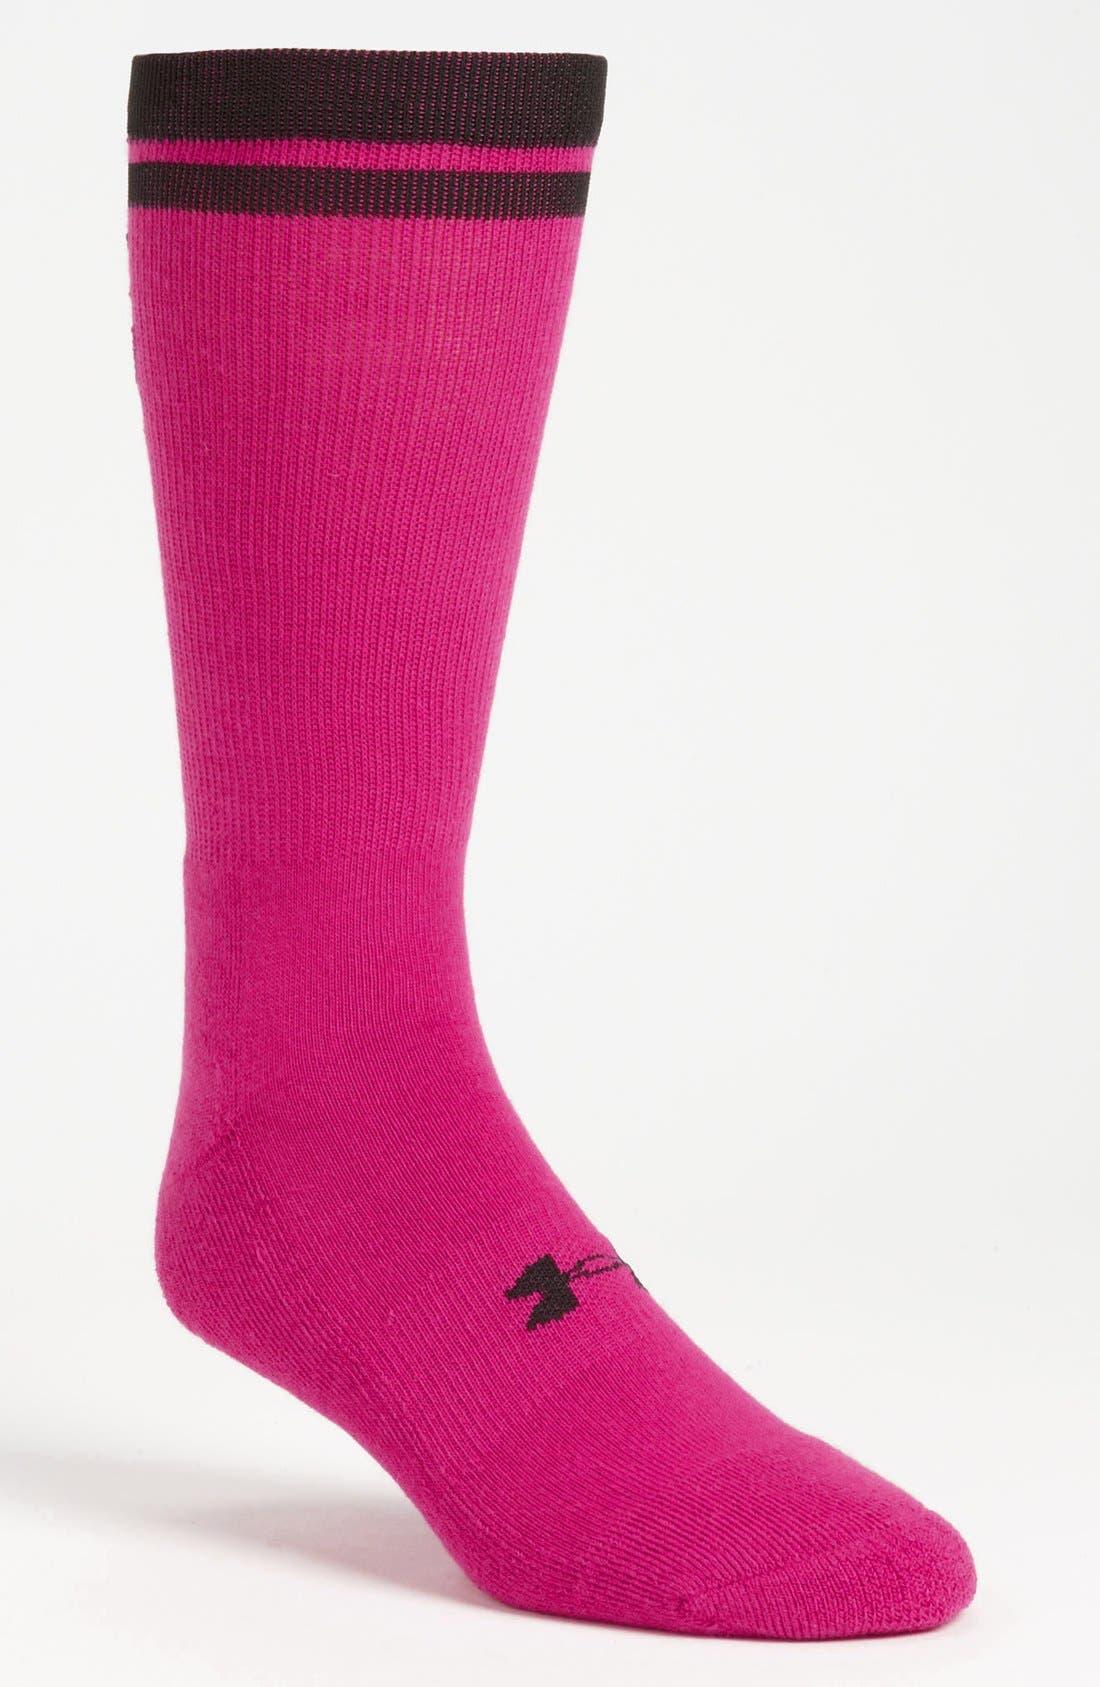 Main Image - Under Armour 'Zagger' Crew Socks